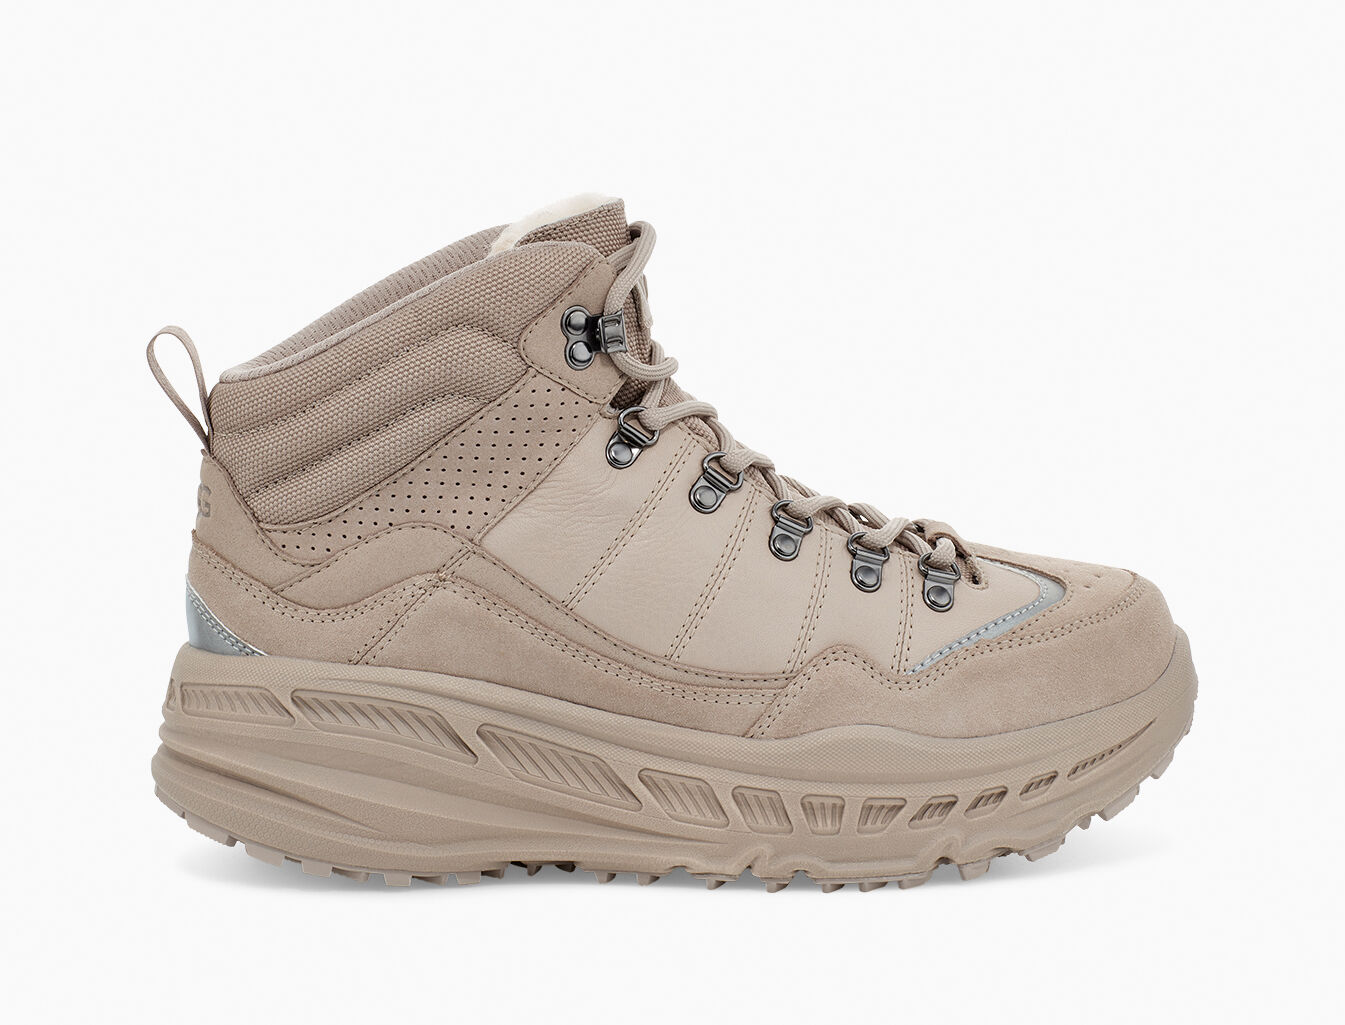 UGG® CA805 Hiker Weather Trainer for